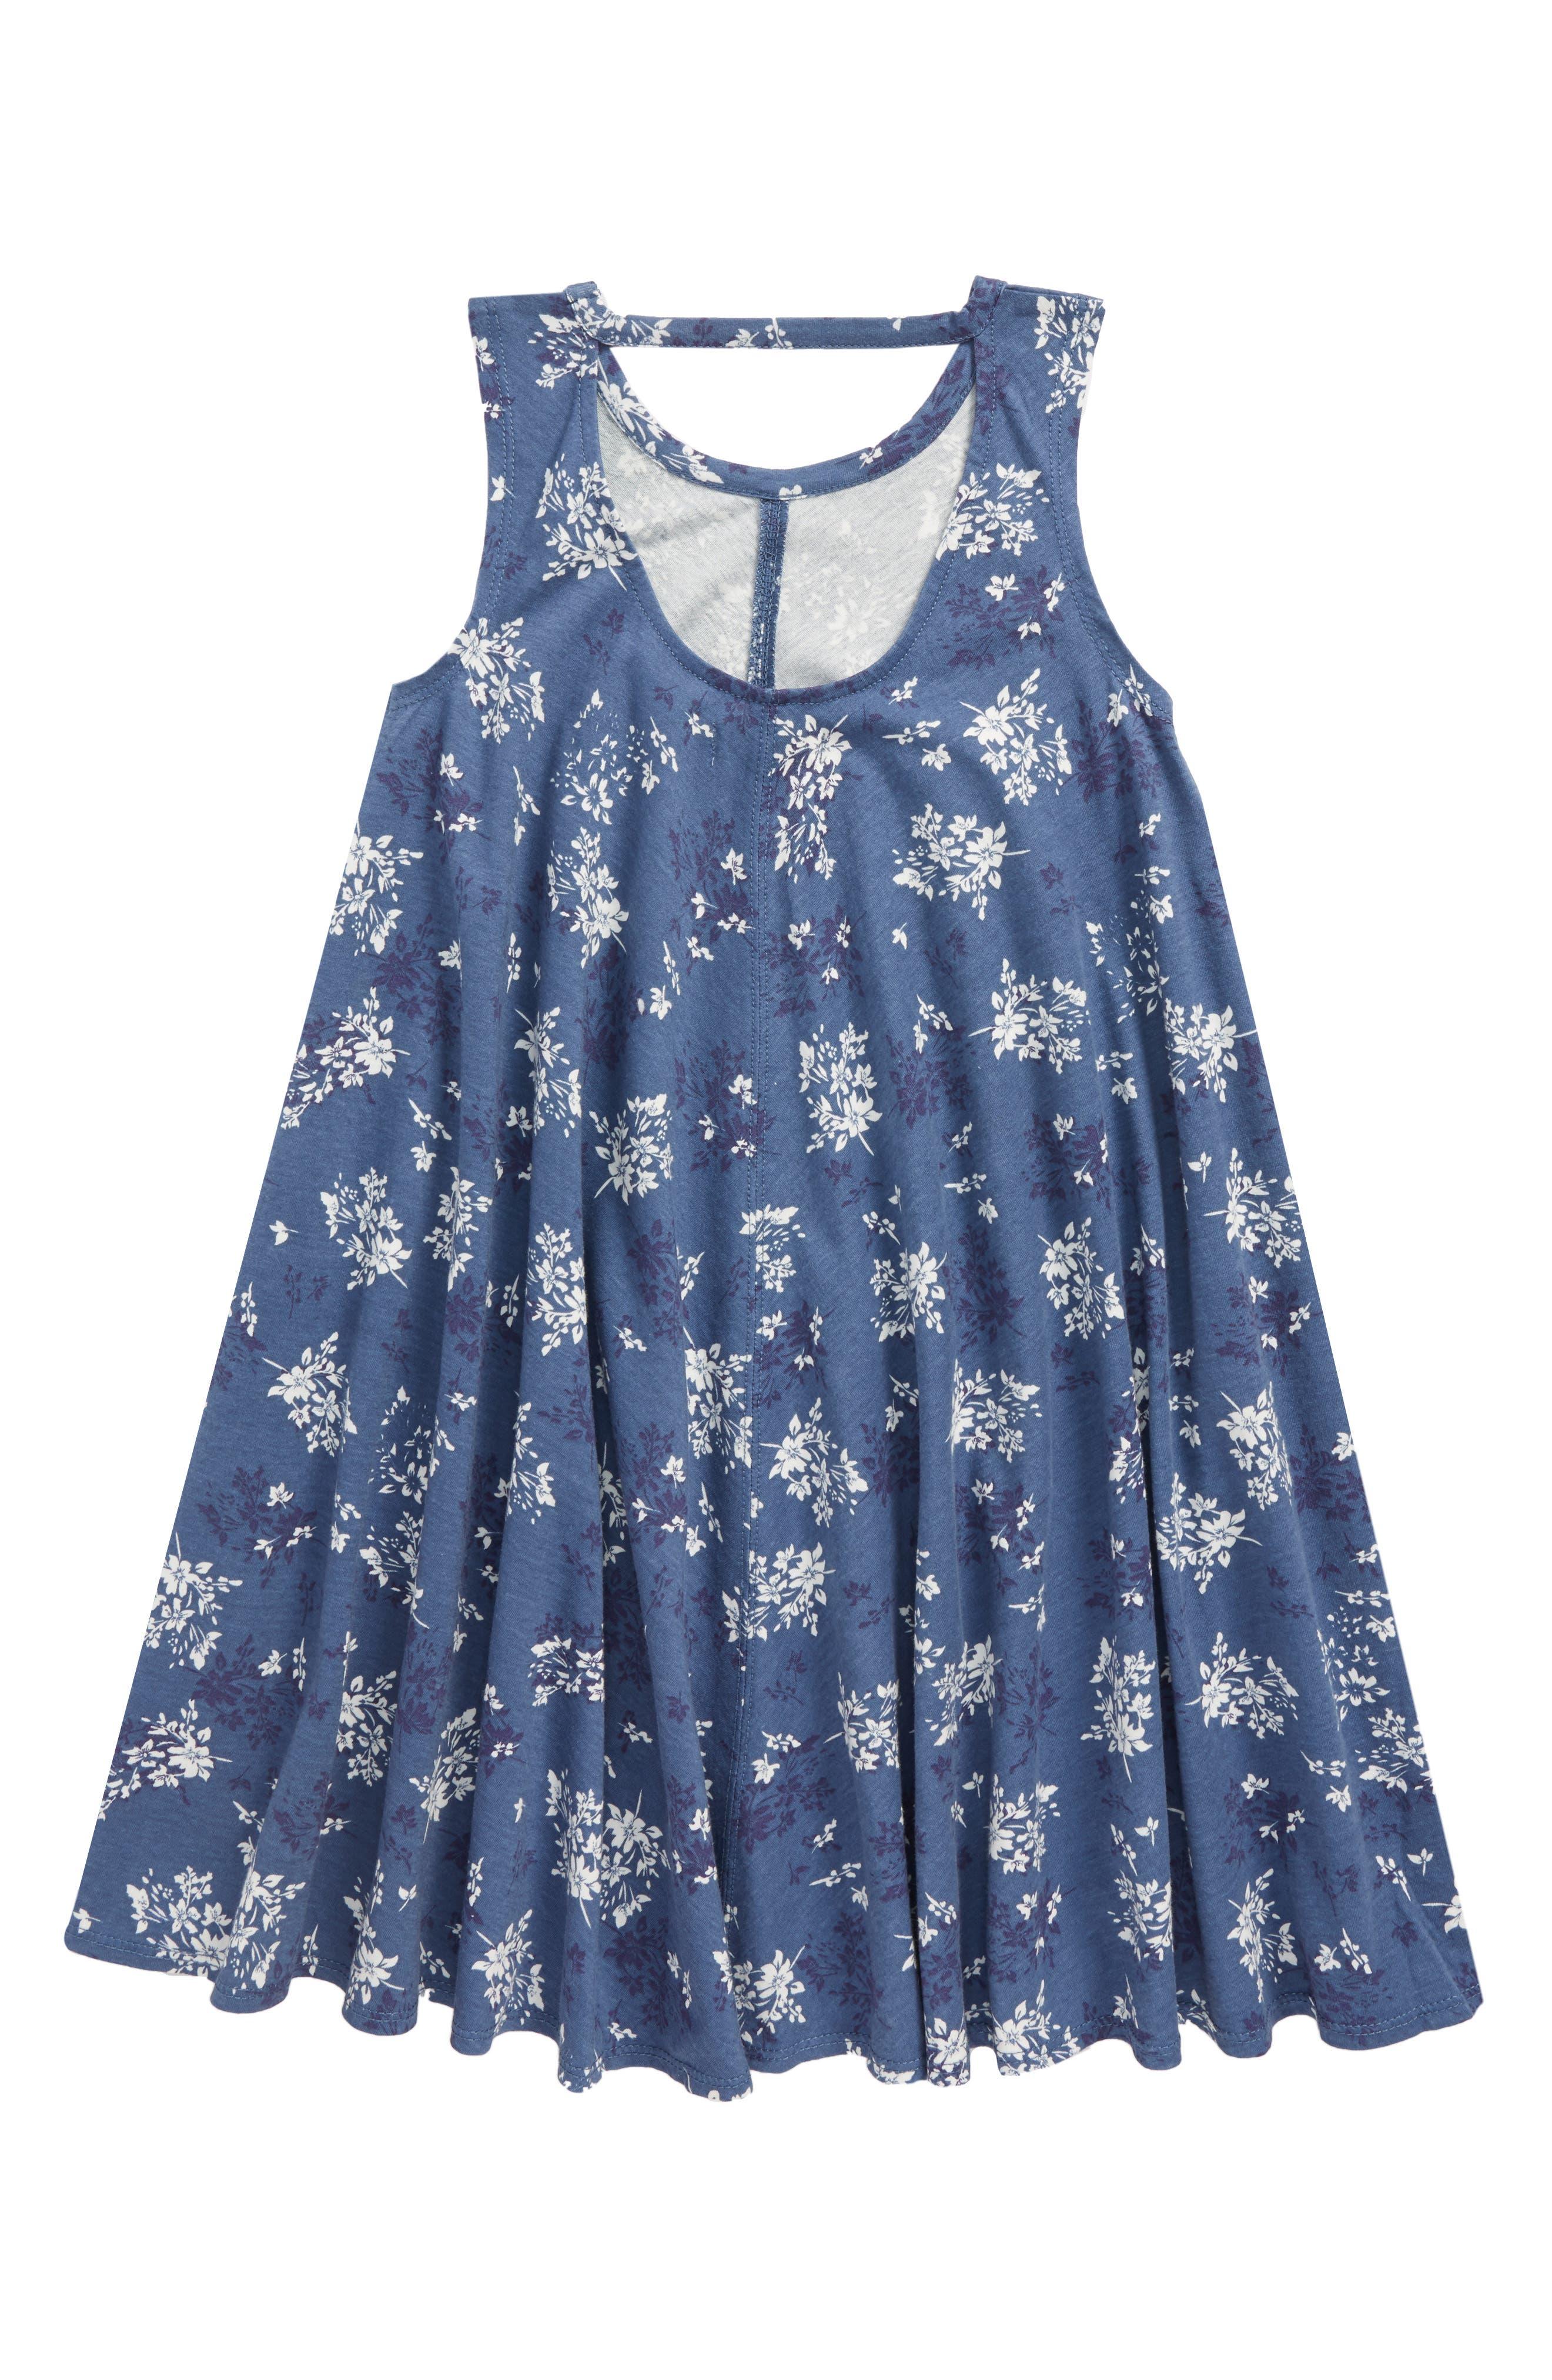 Cotton Swing Dress,                             Alternate thumbnail 2, color,                             420